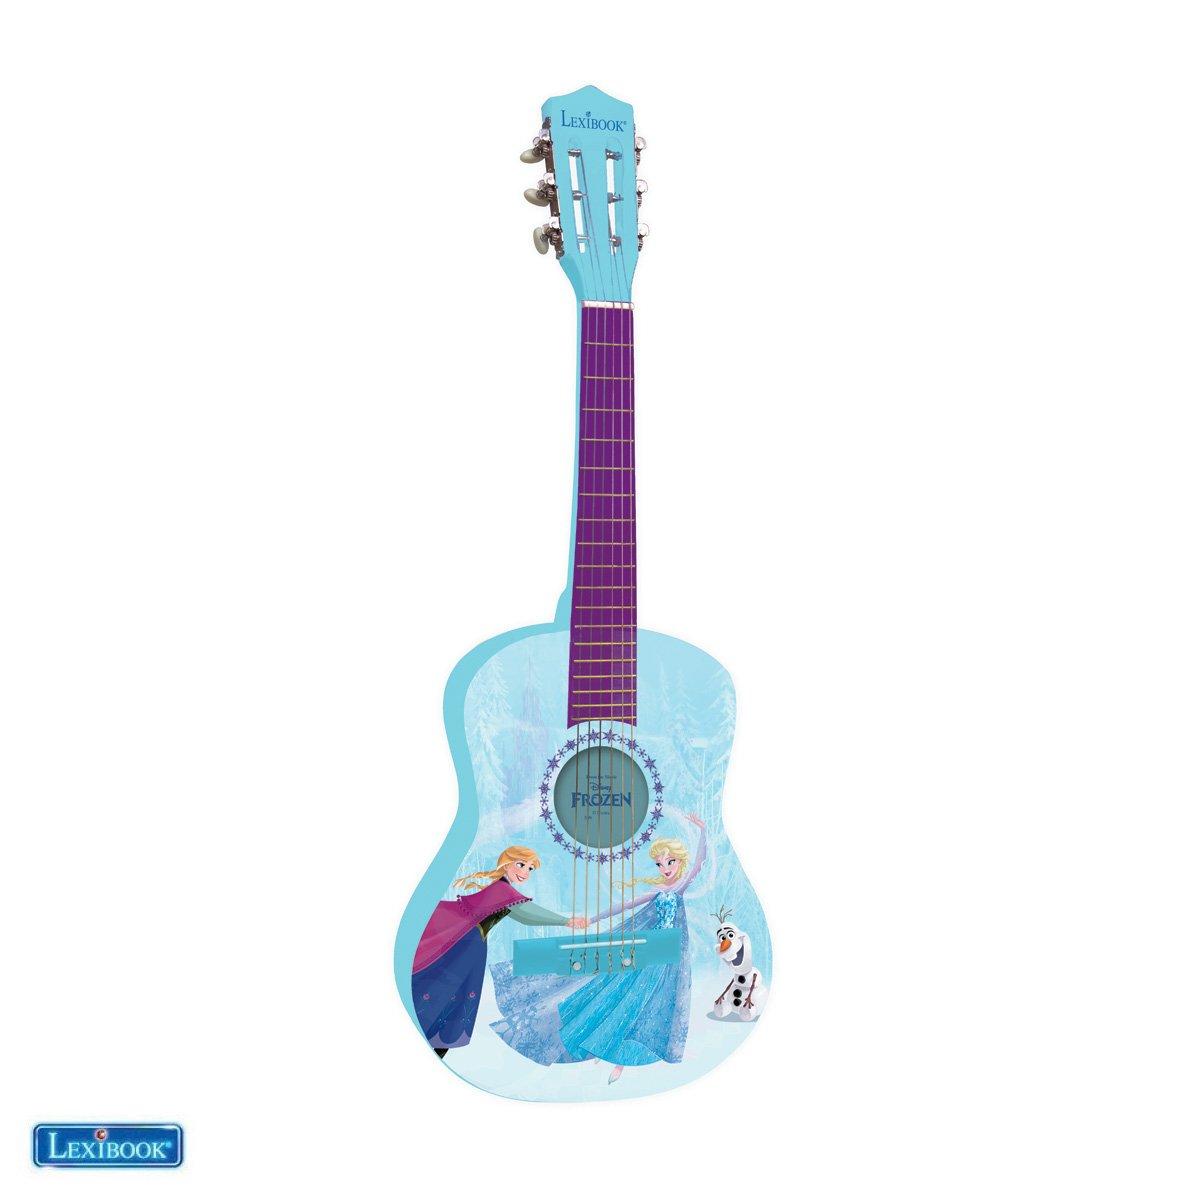 Lexibook - Disney Frozen Acoustic Guitar - 31'' (K2000FZ)